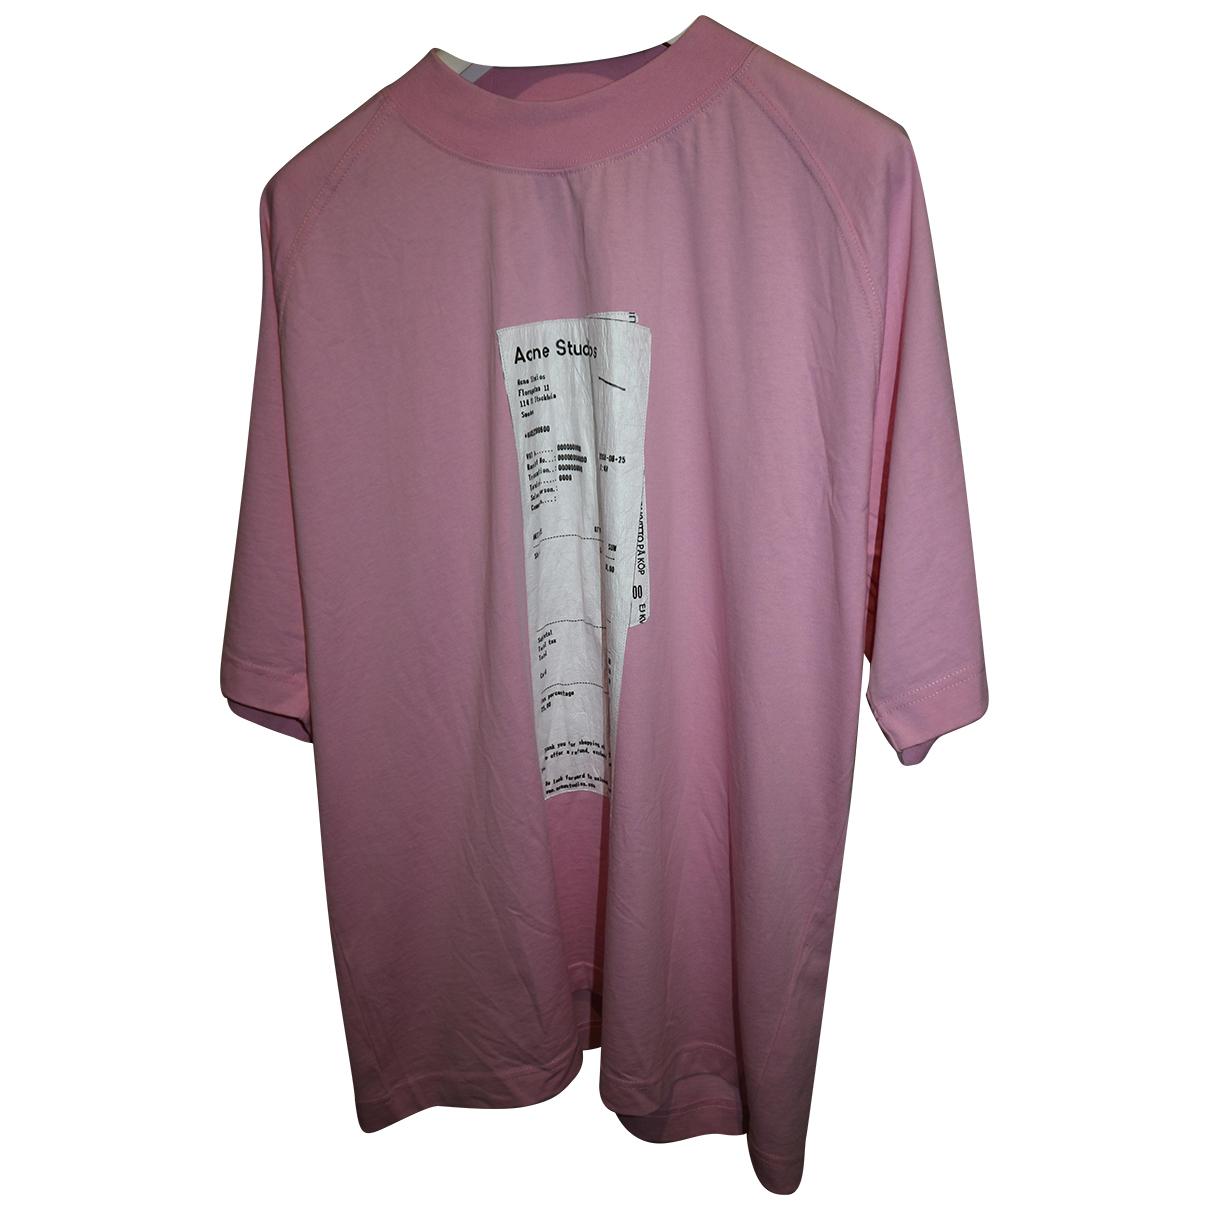 Acne Studios Blå Konst Pink Cotton  top for Women M International